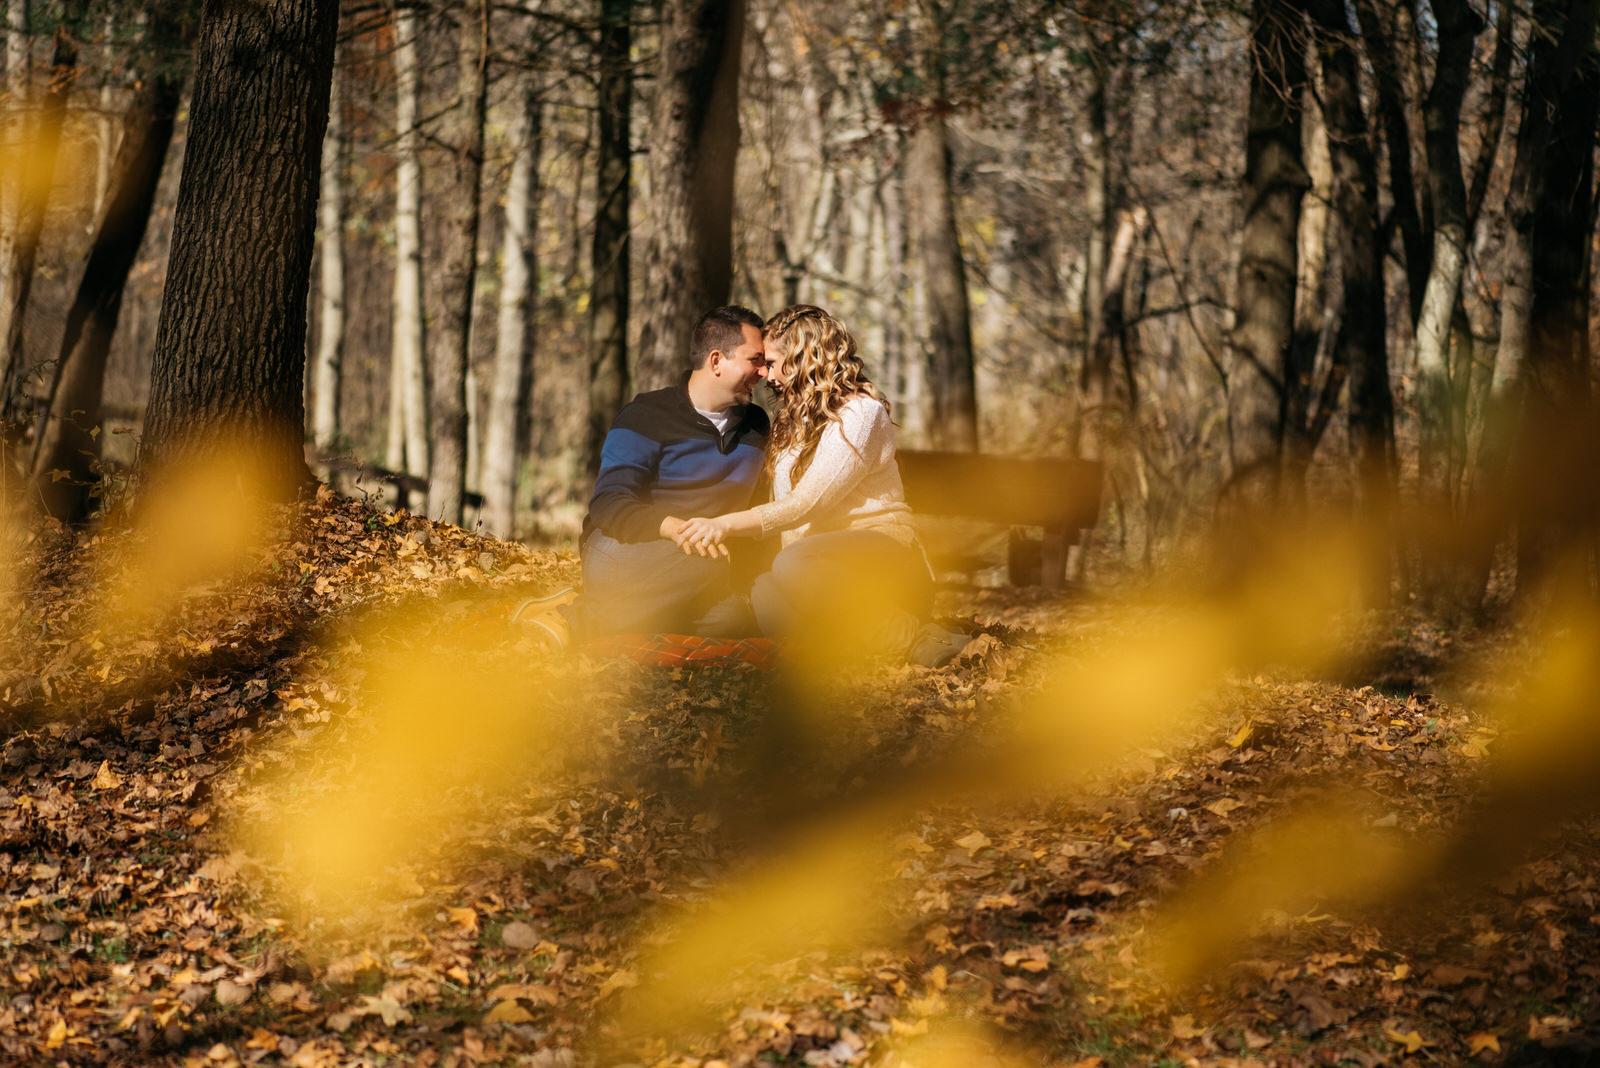 bradys-run-park-engagement-photo-021.jpg